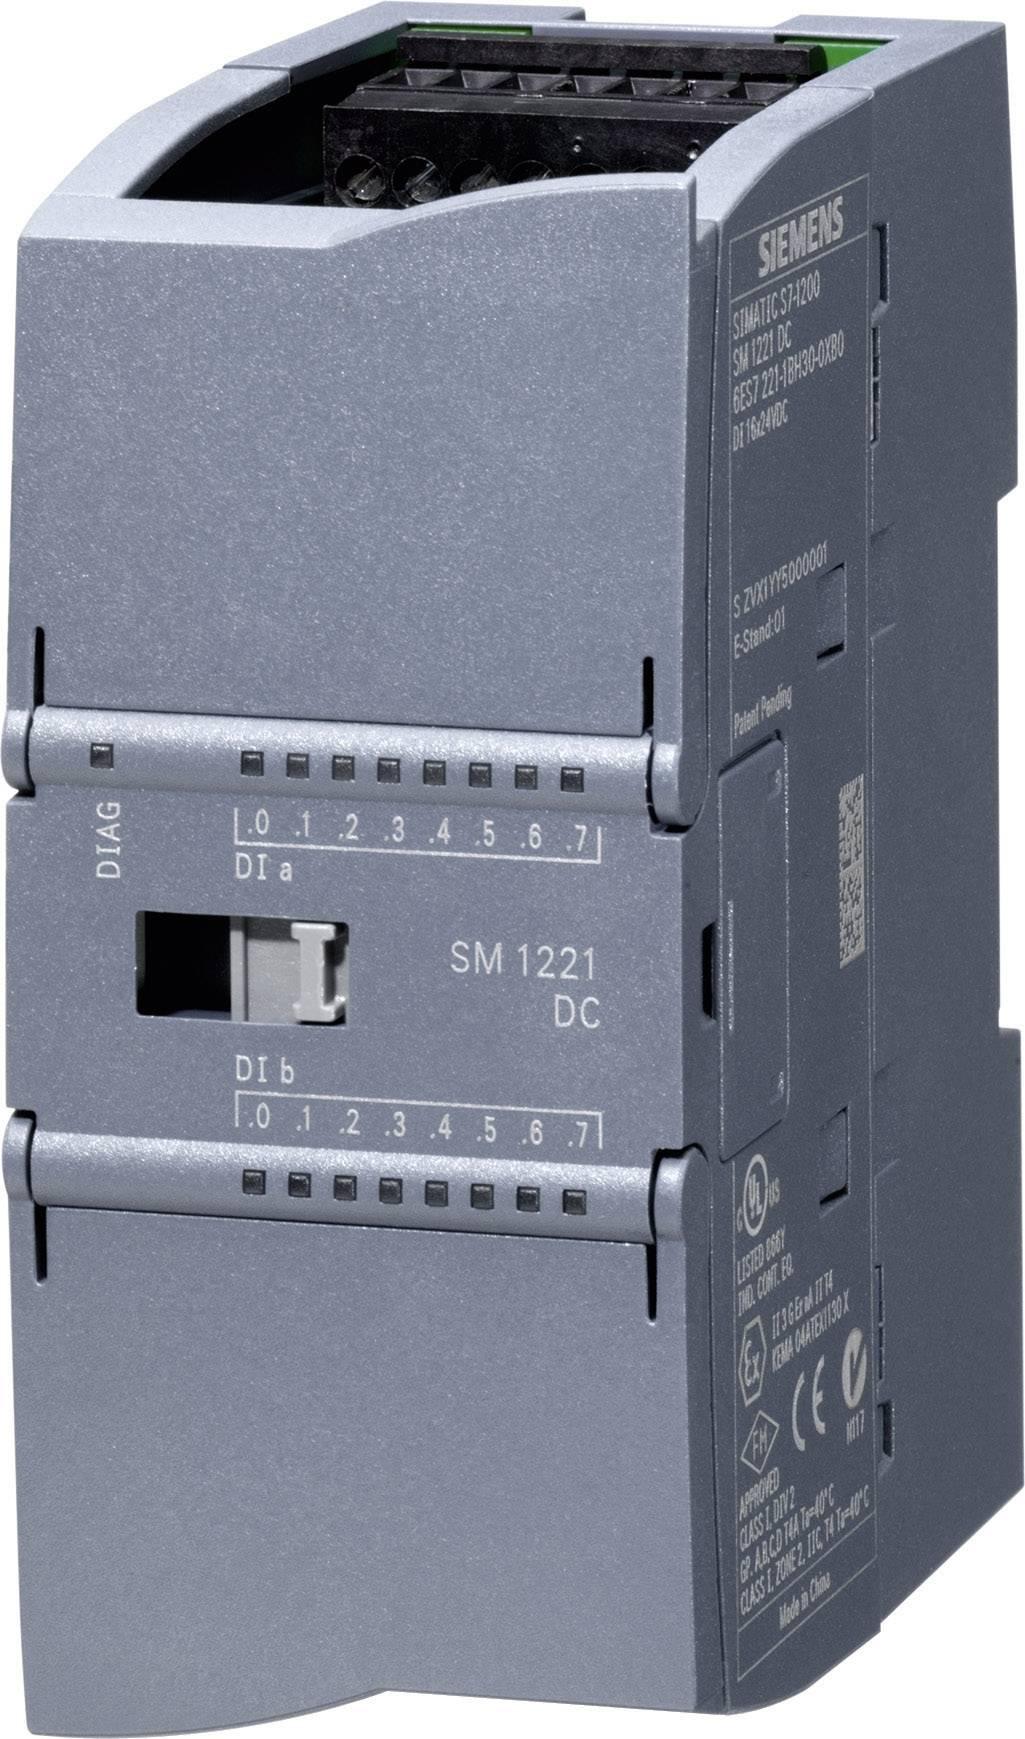 Rozšiřovací PLC modul Siemens SM 1221 (6ES7221-1BH32-0XB0)